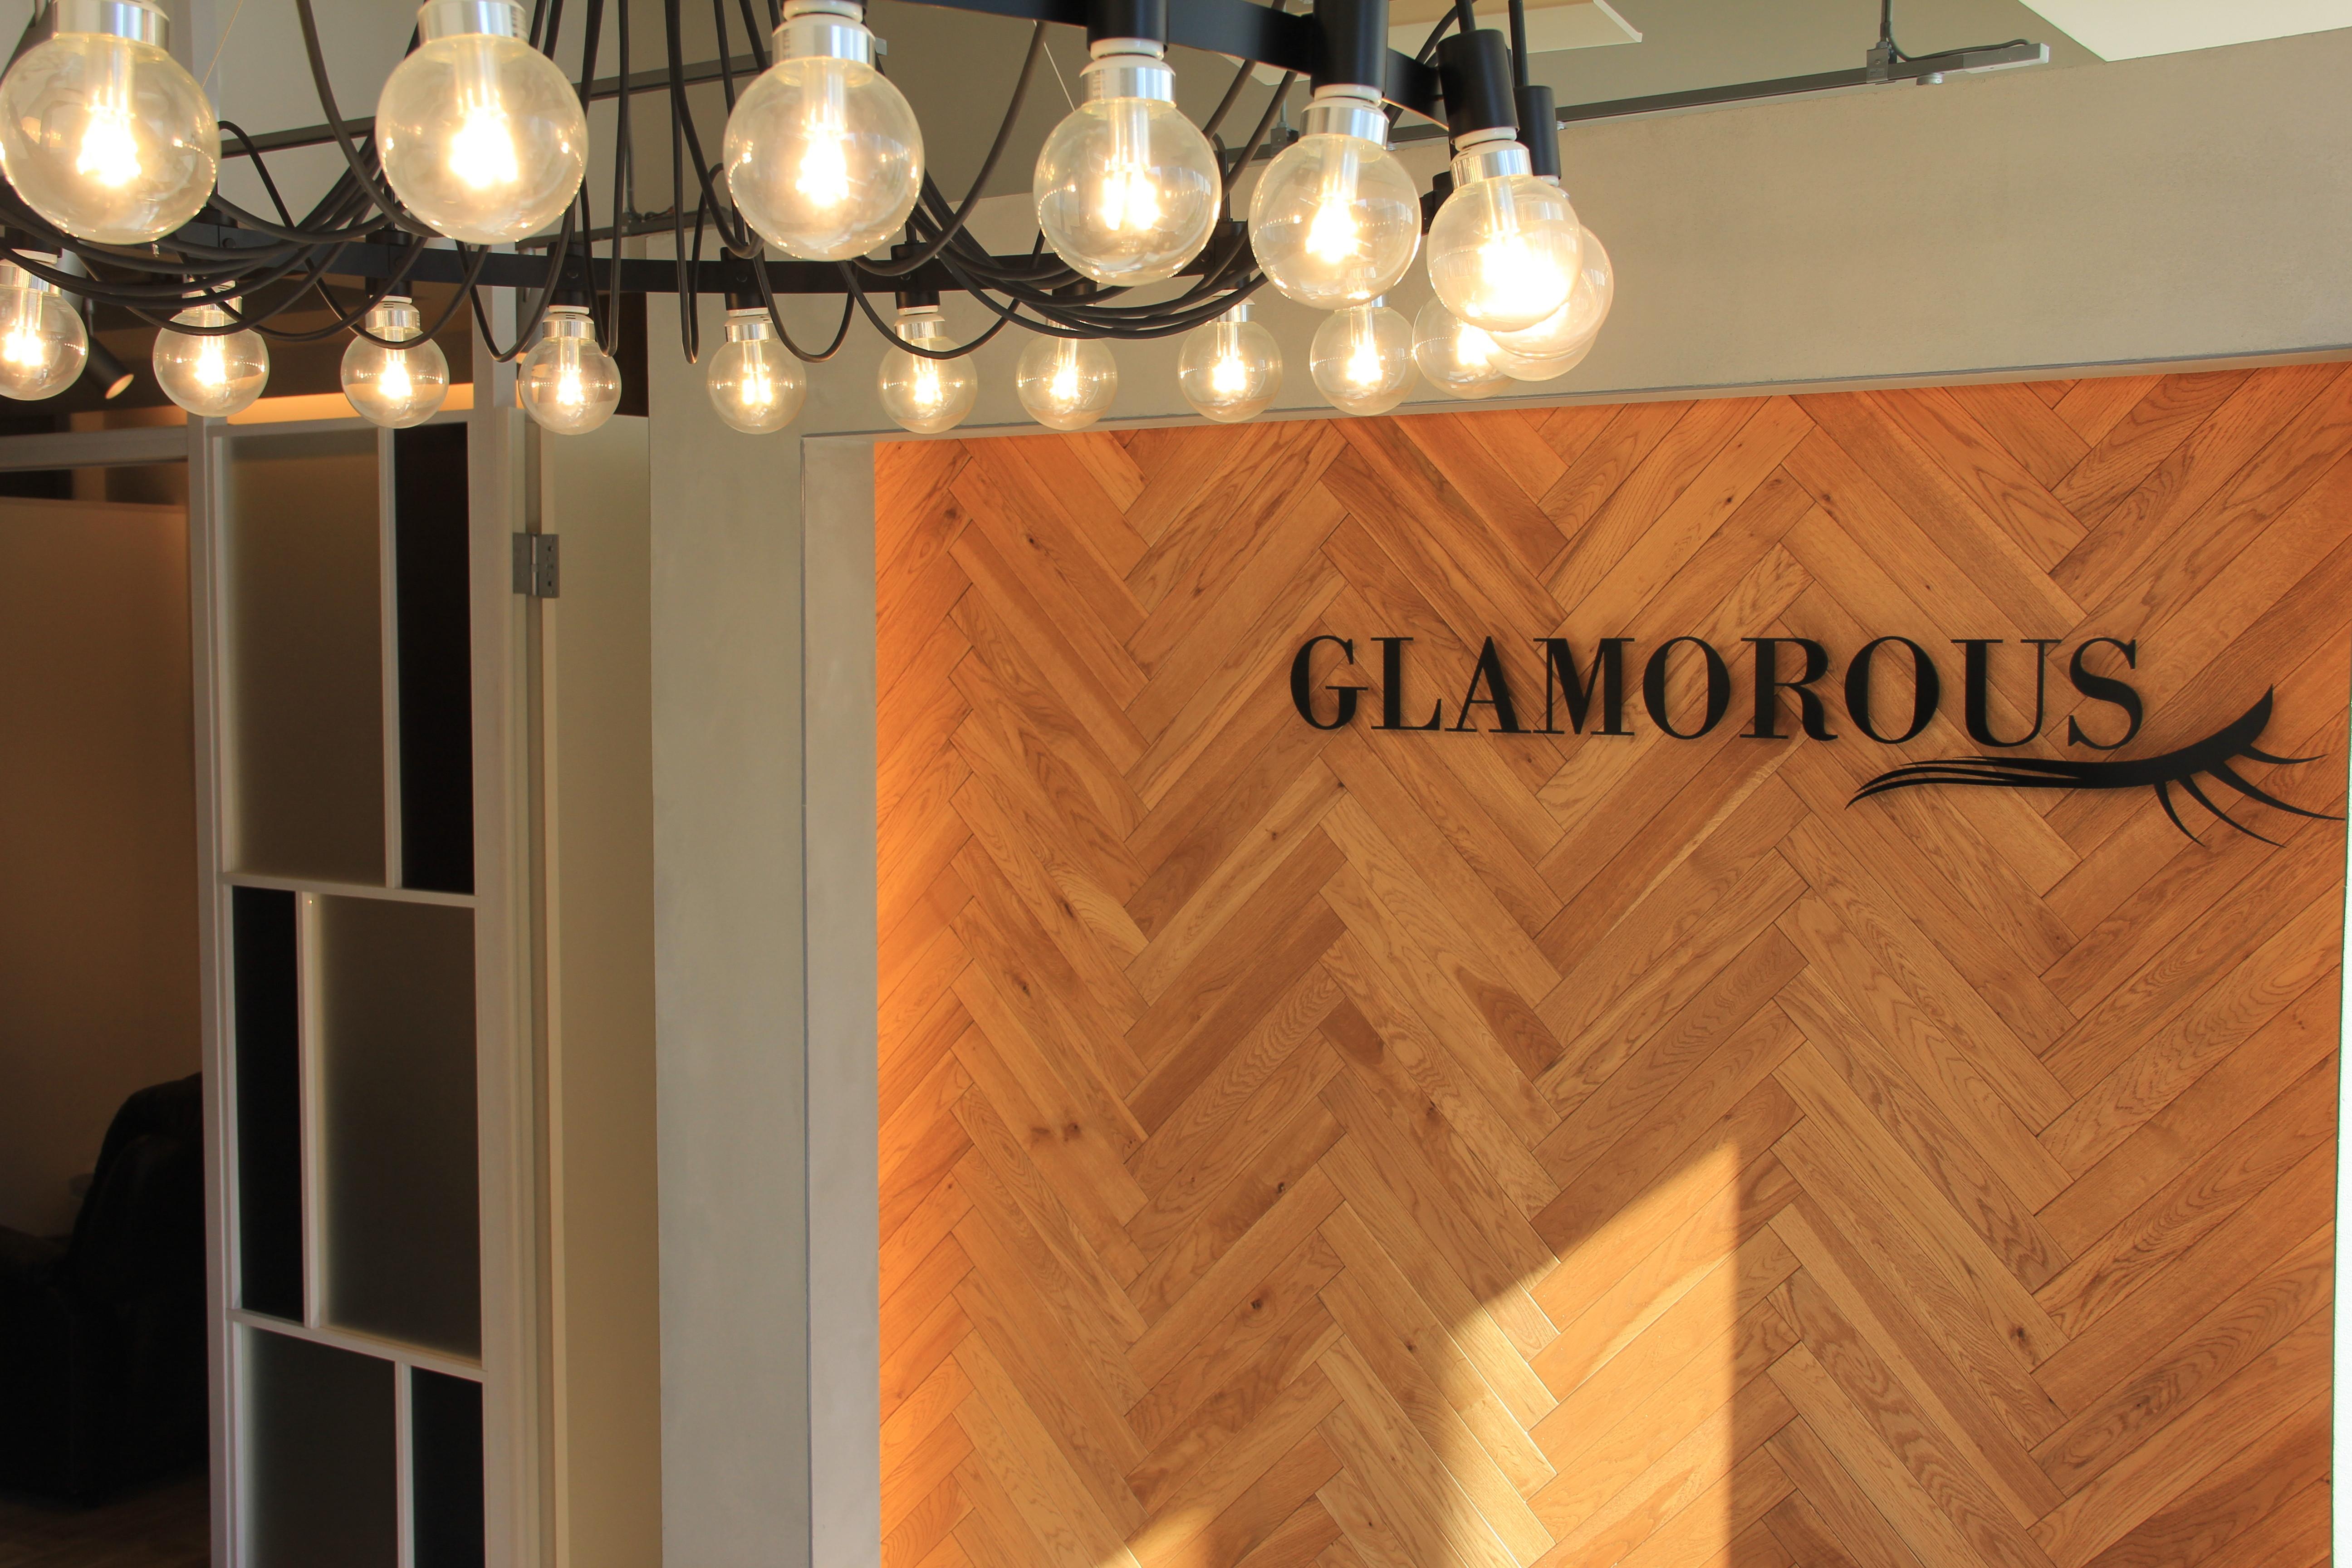 GLAMOROUS(グラマラス) 恵比寿店のアルバイト情報